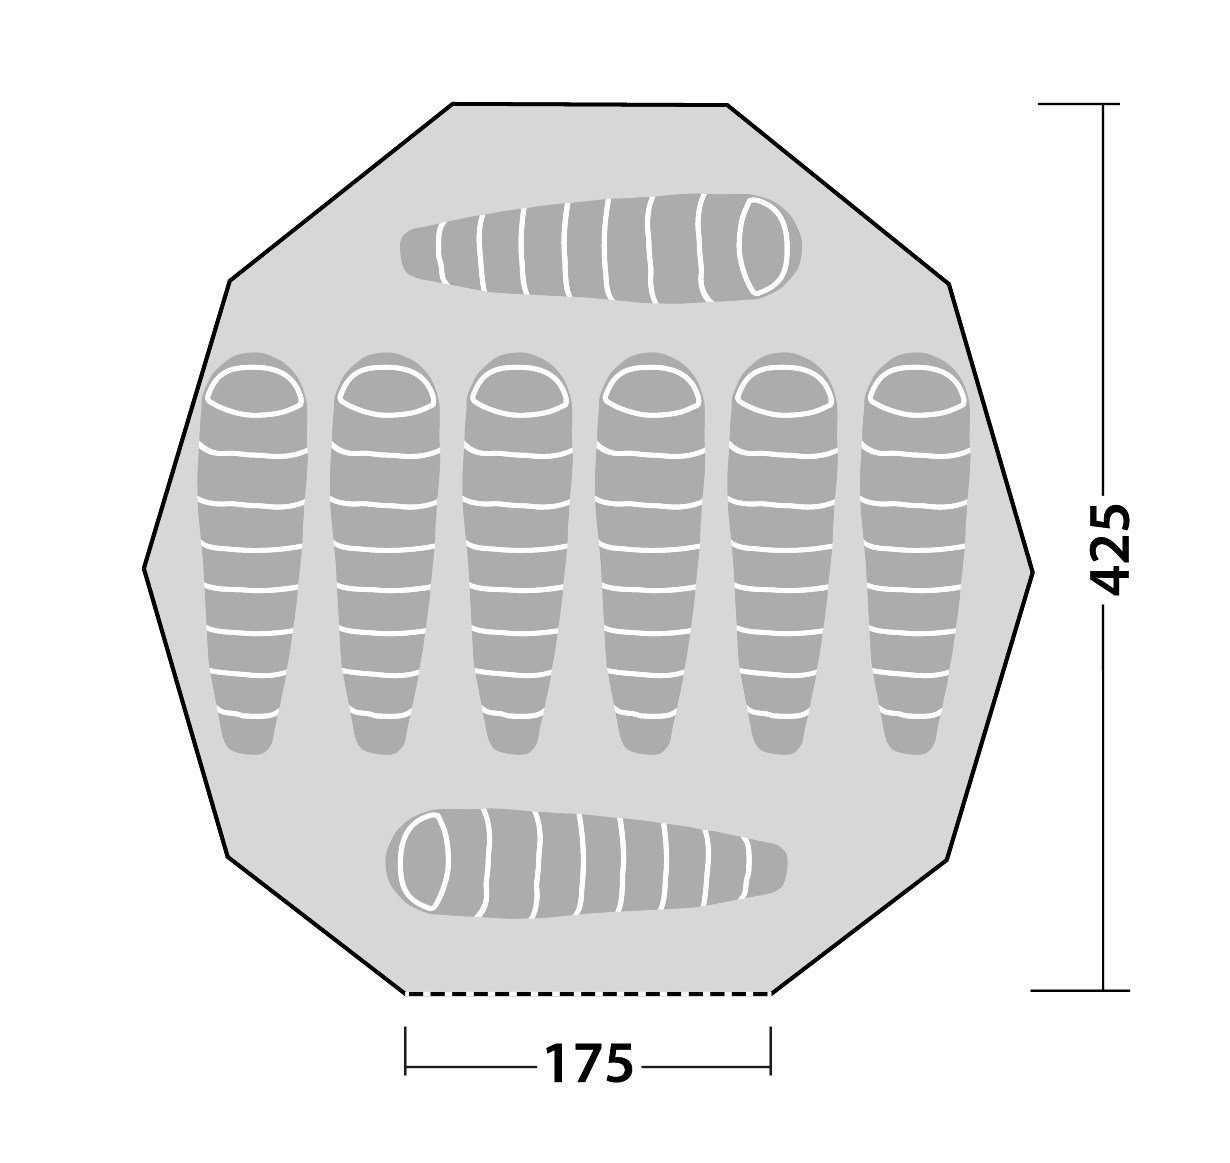 130208_Chinook_Drawing Floorplan3